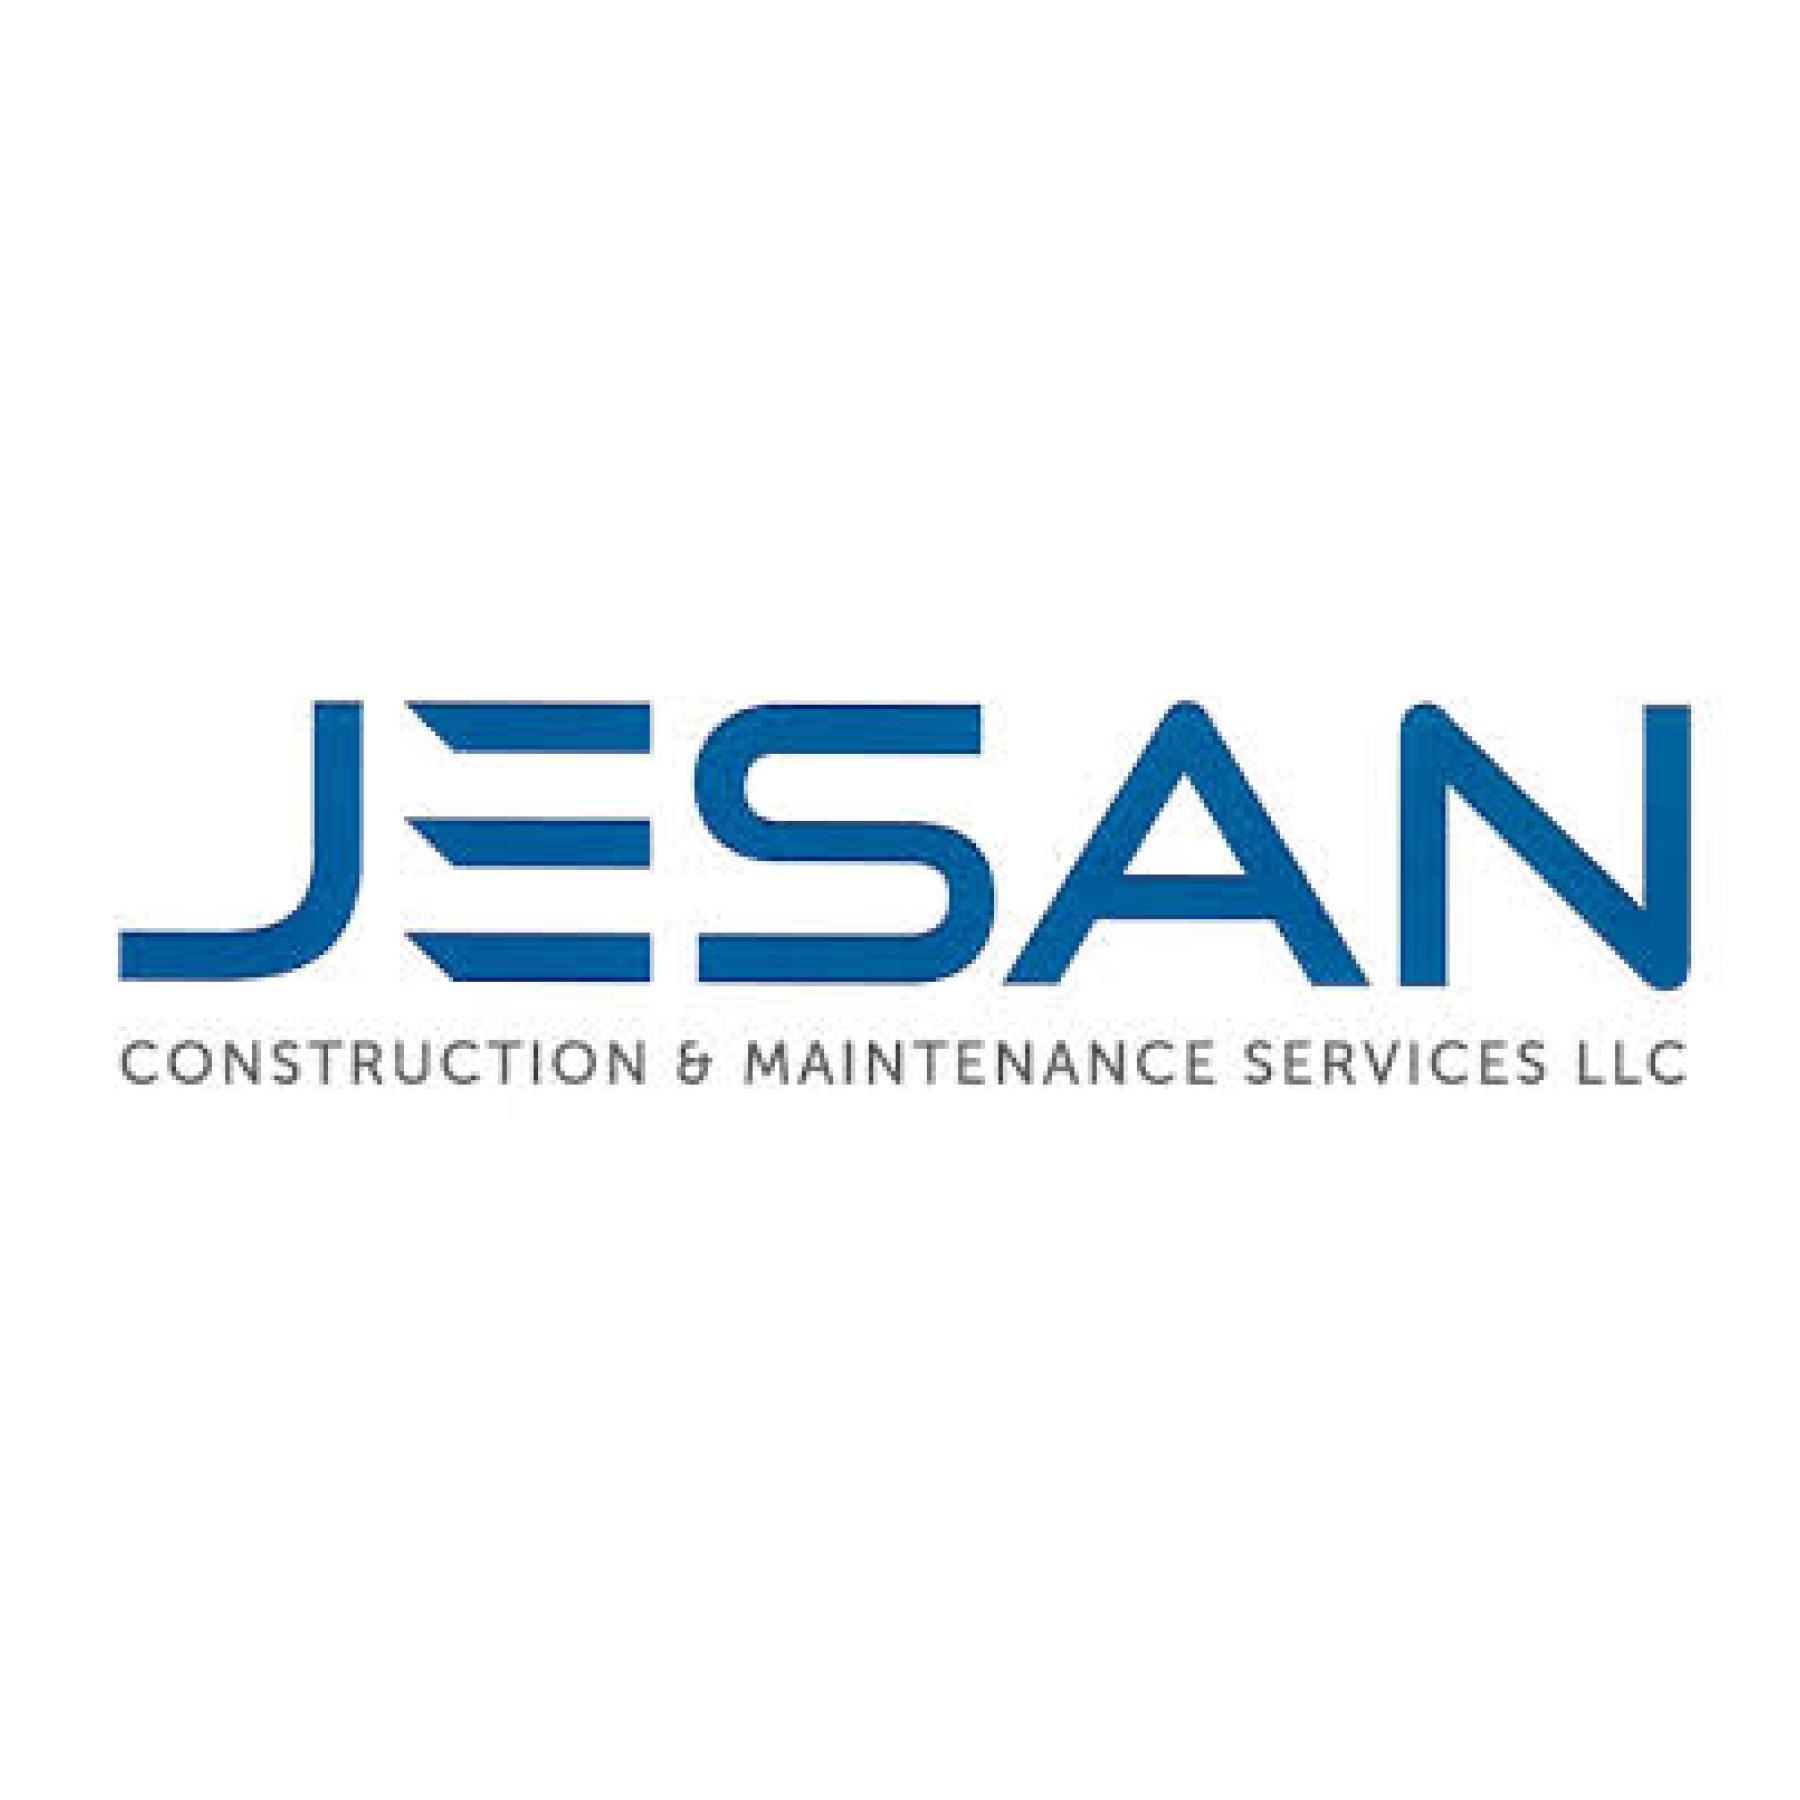 Jesan Construction & Maintenance